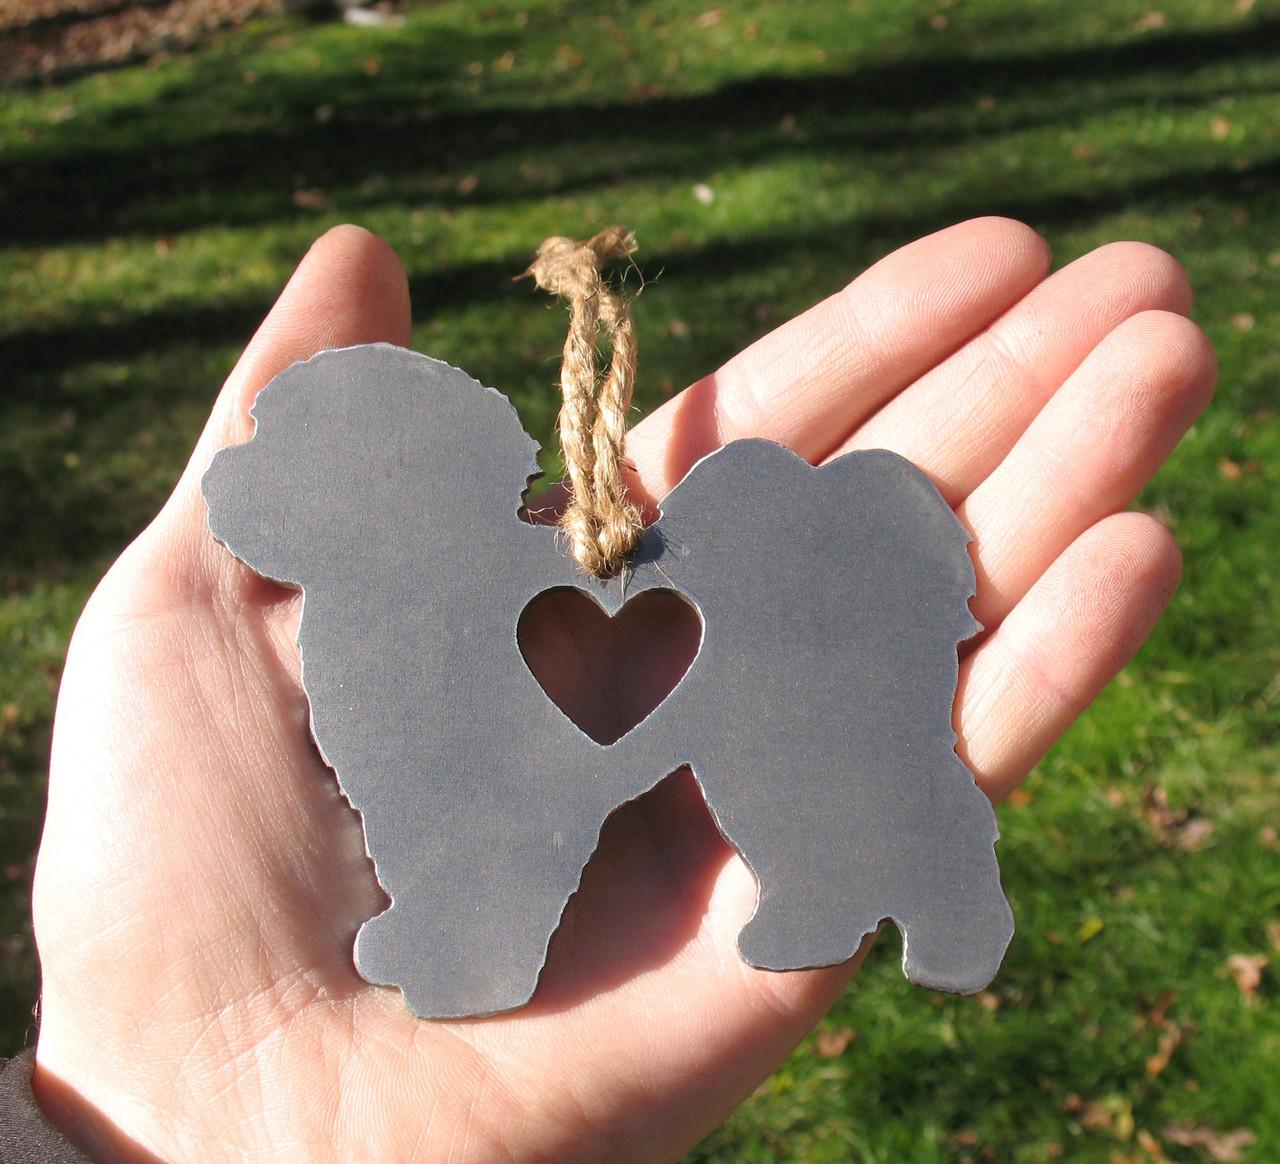 Shih Tzu 2 Pet Loss Gift Ornament - Pet Memorial - Dog Sympathy Remembrance Gift - Metal Dog Christmas Ornament